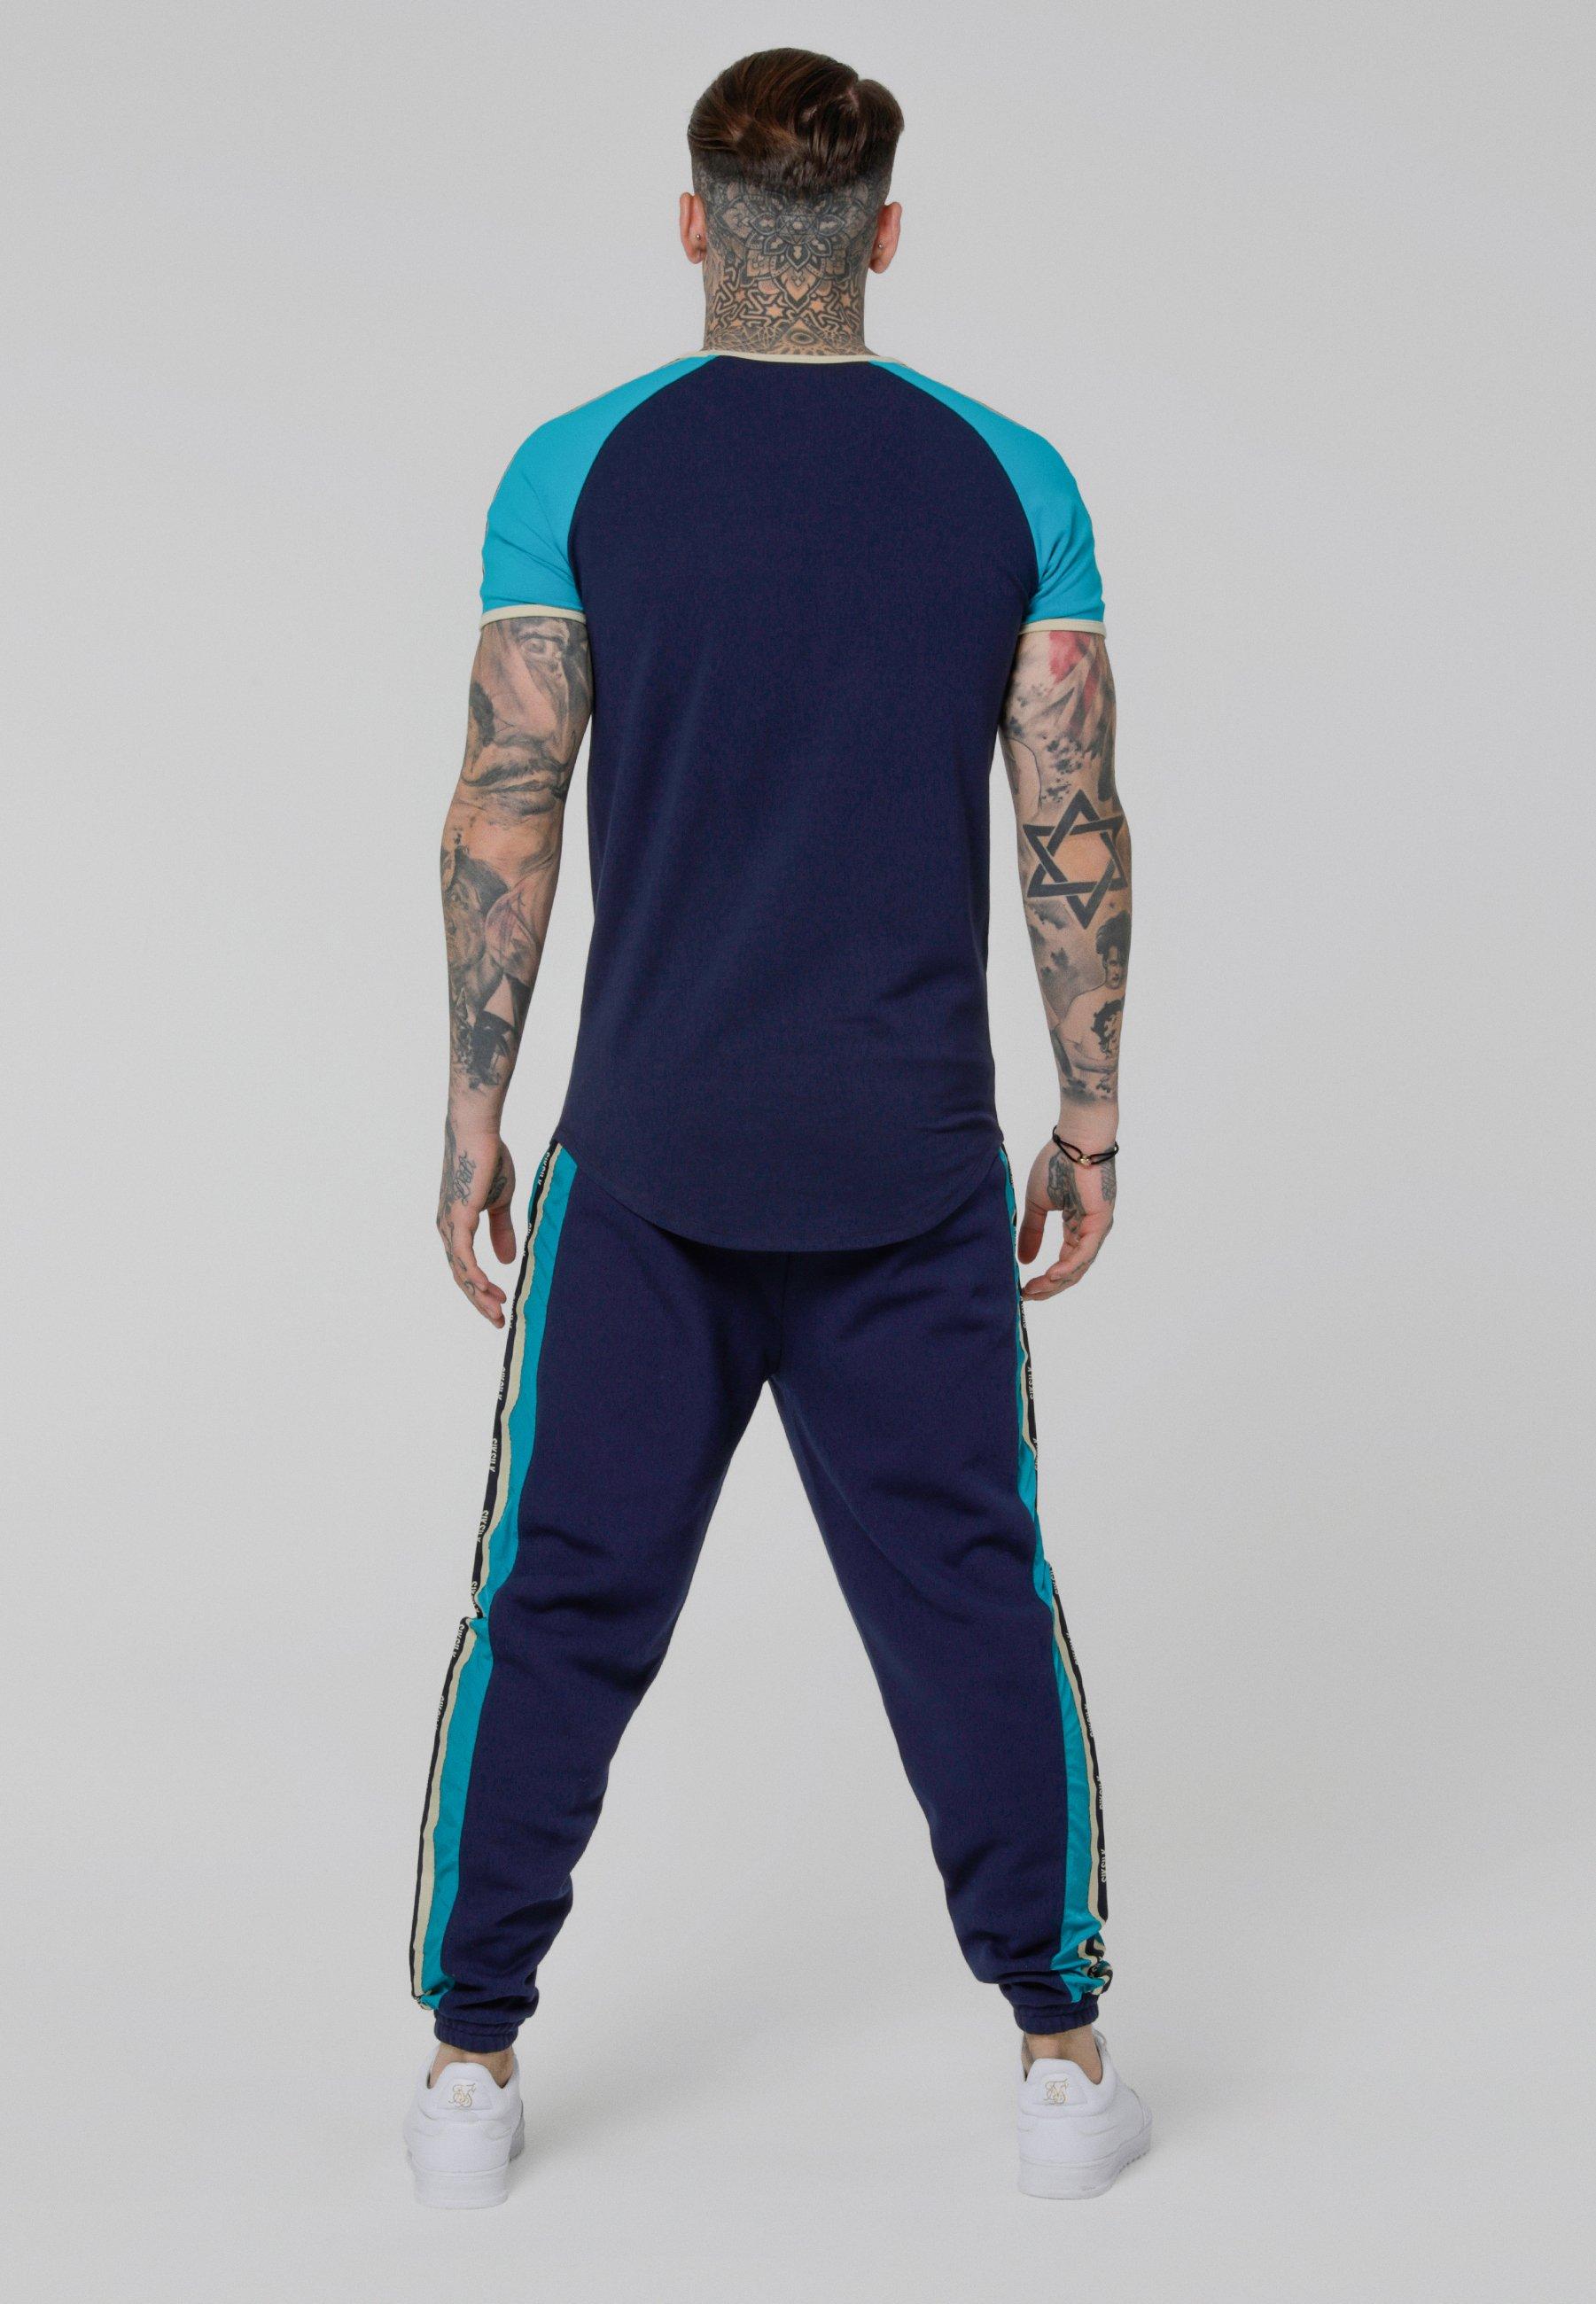 shirt Siksilk Gym Contrast Teal TeeT navy Tape Imprimé 354AjqRL